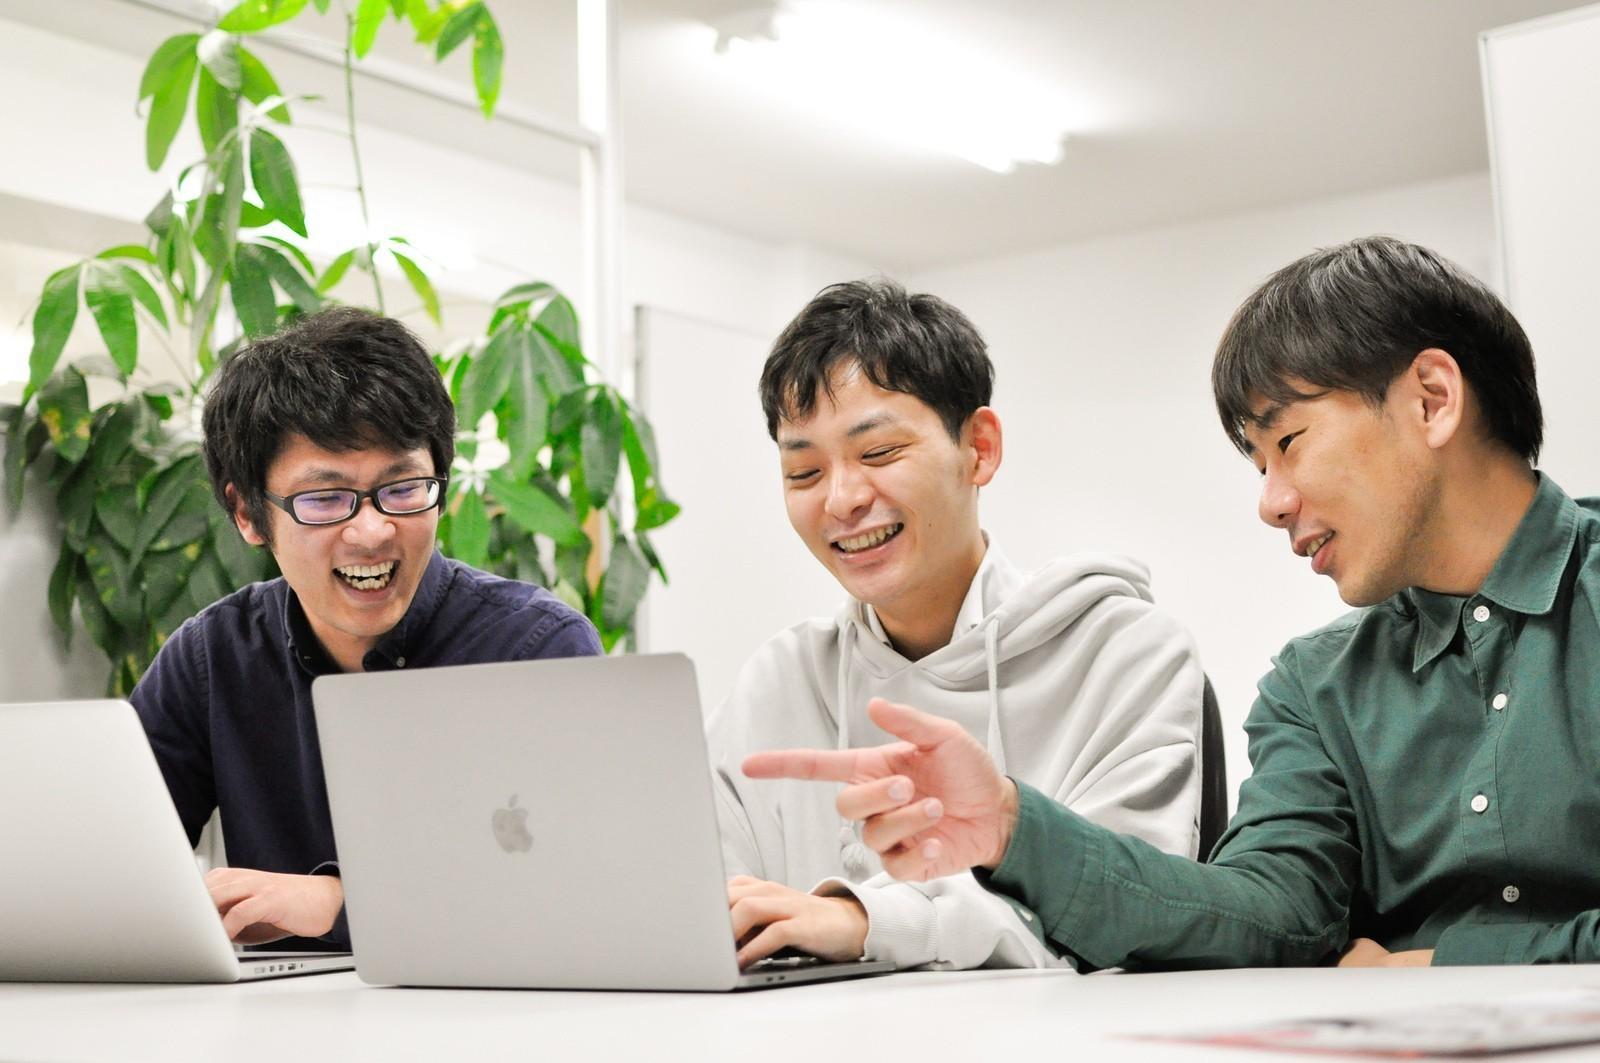 <Ruby/Rails>業界シェアNo.1自社サービスを支えるサーバサイドエンジニア募集!業界変革に挑みませんか?